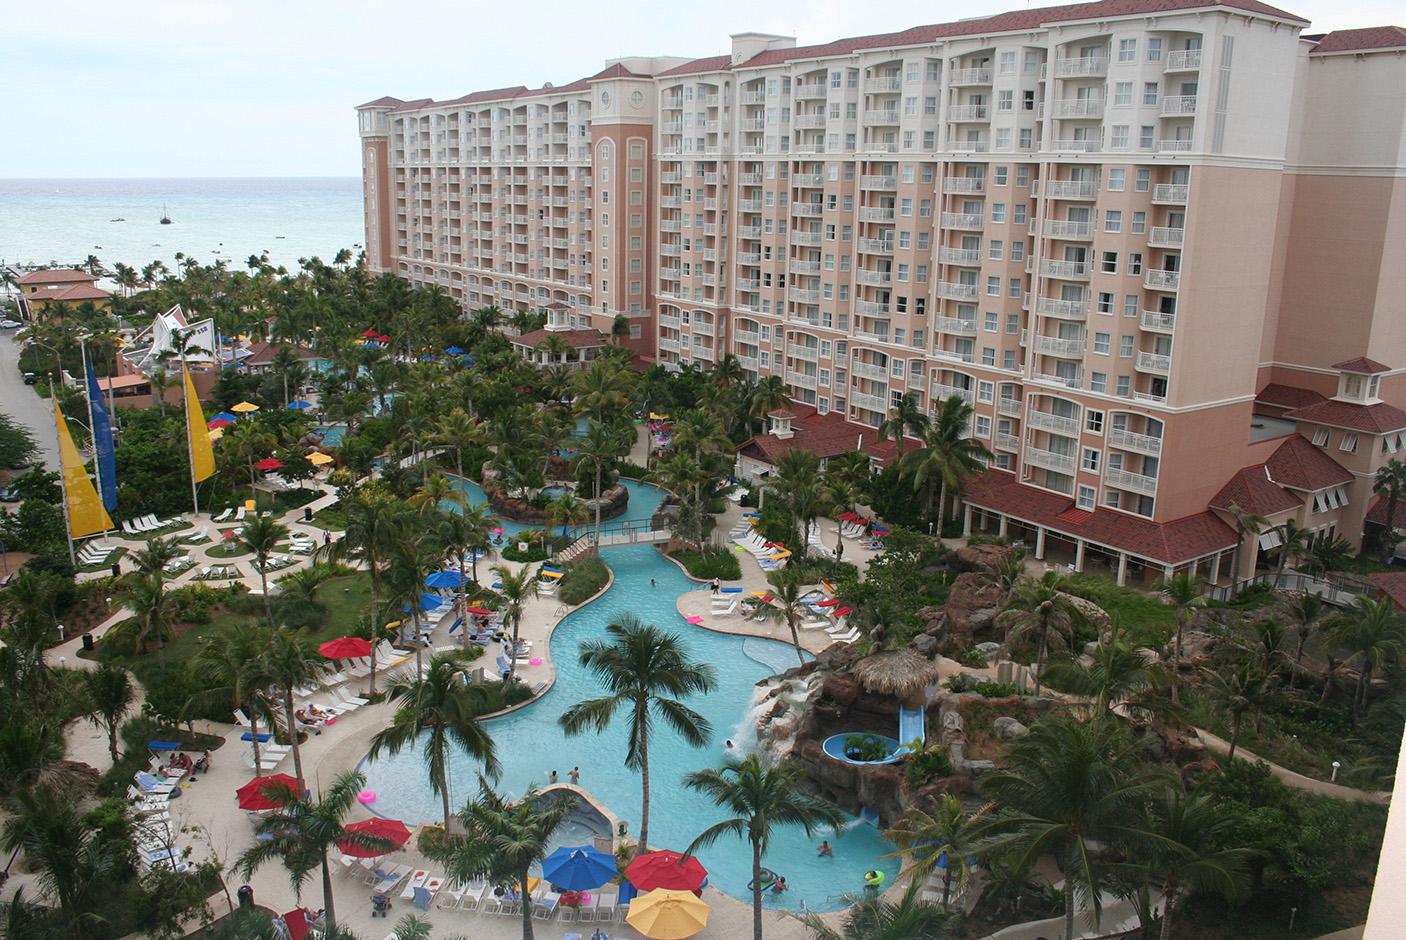 Marriott Aruba Surf Club  Aruba All Inclusive Resorts